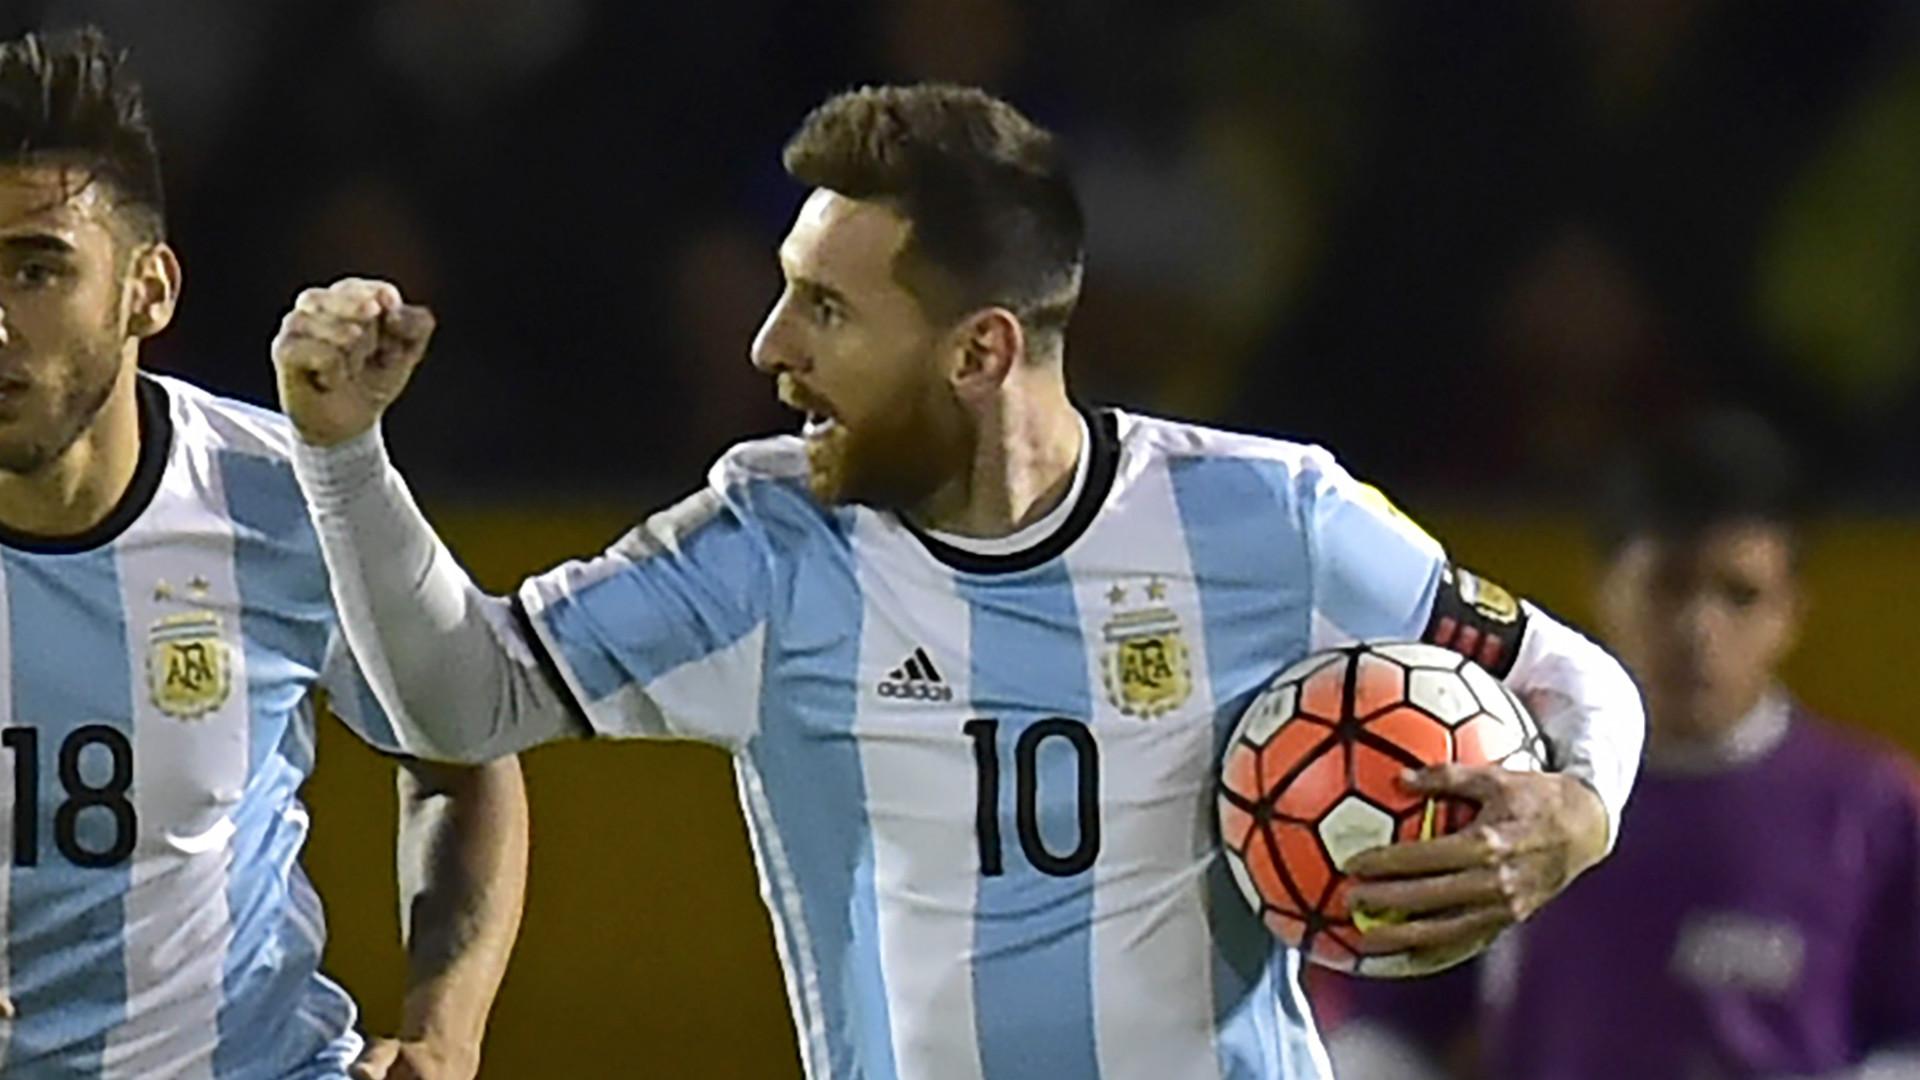 Fußball-Artikel Gloves Match Marchesin Club America Goalkeeper Argentina tem